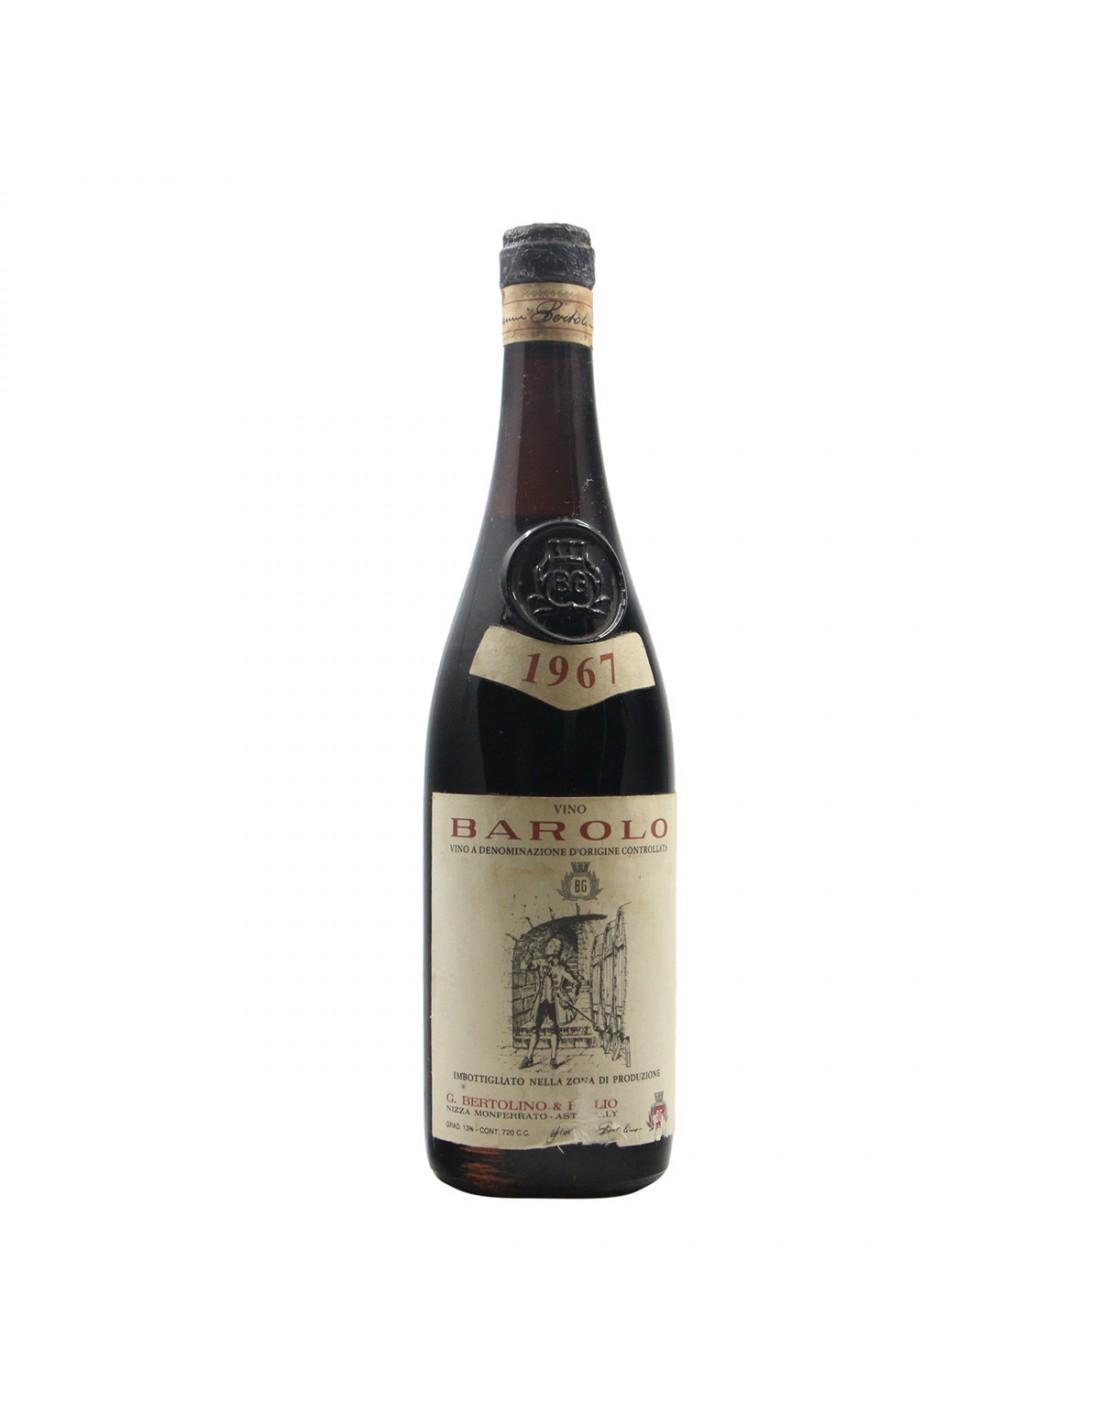 BAROLO 1967 BERTOLINO GIOVANNI Grandi Bottiglie